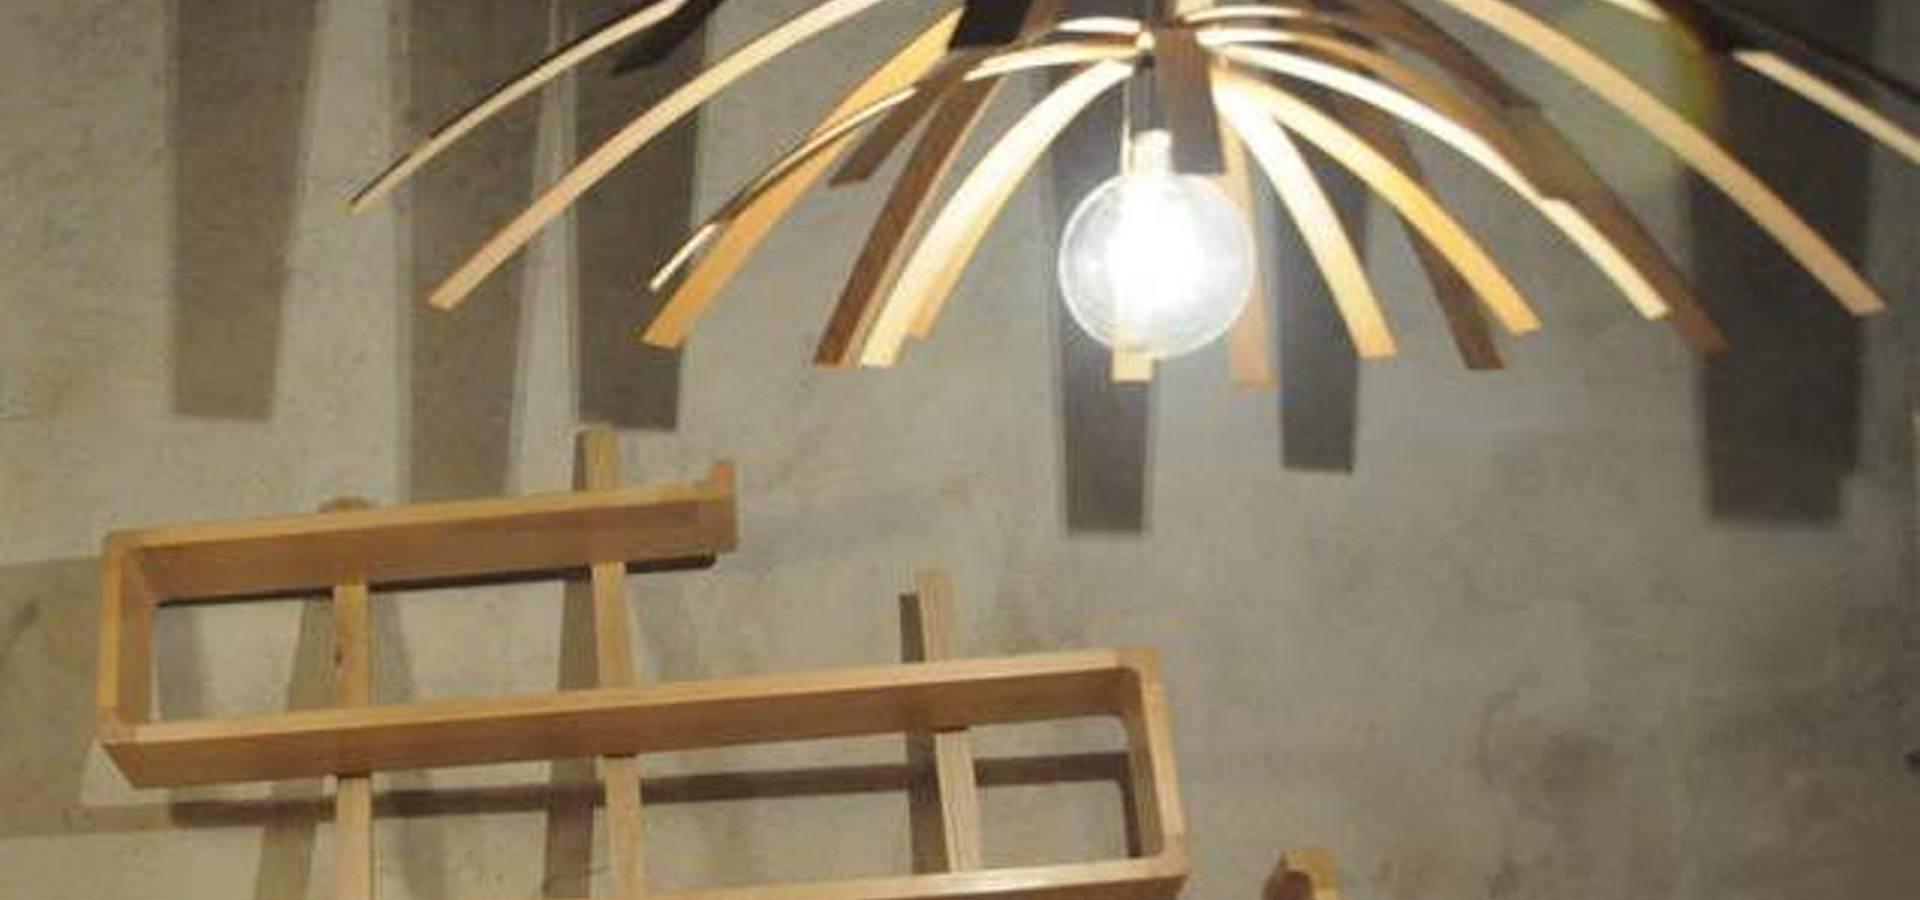 Atelier A RawMat- Lionel Truntzer